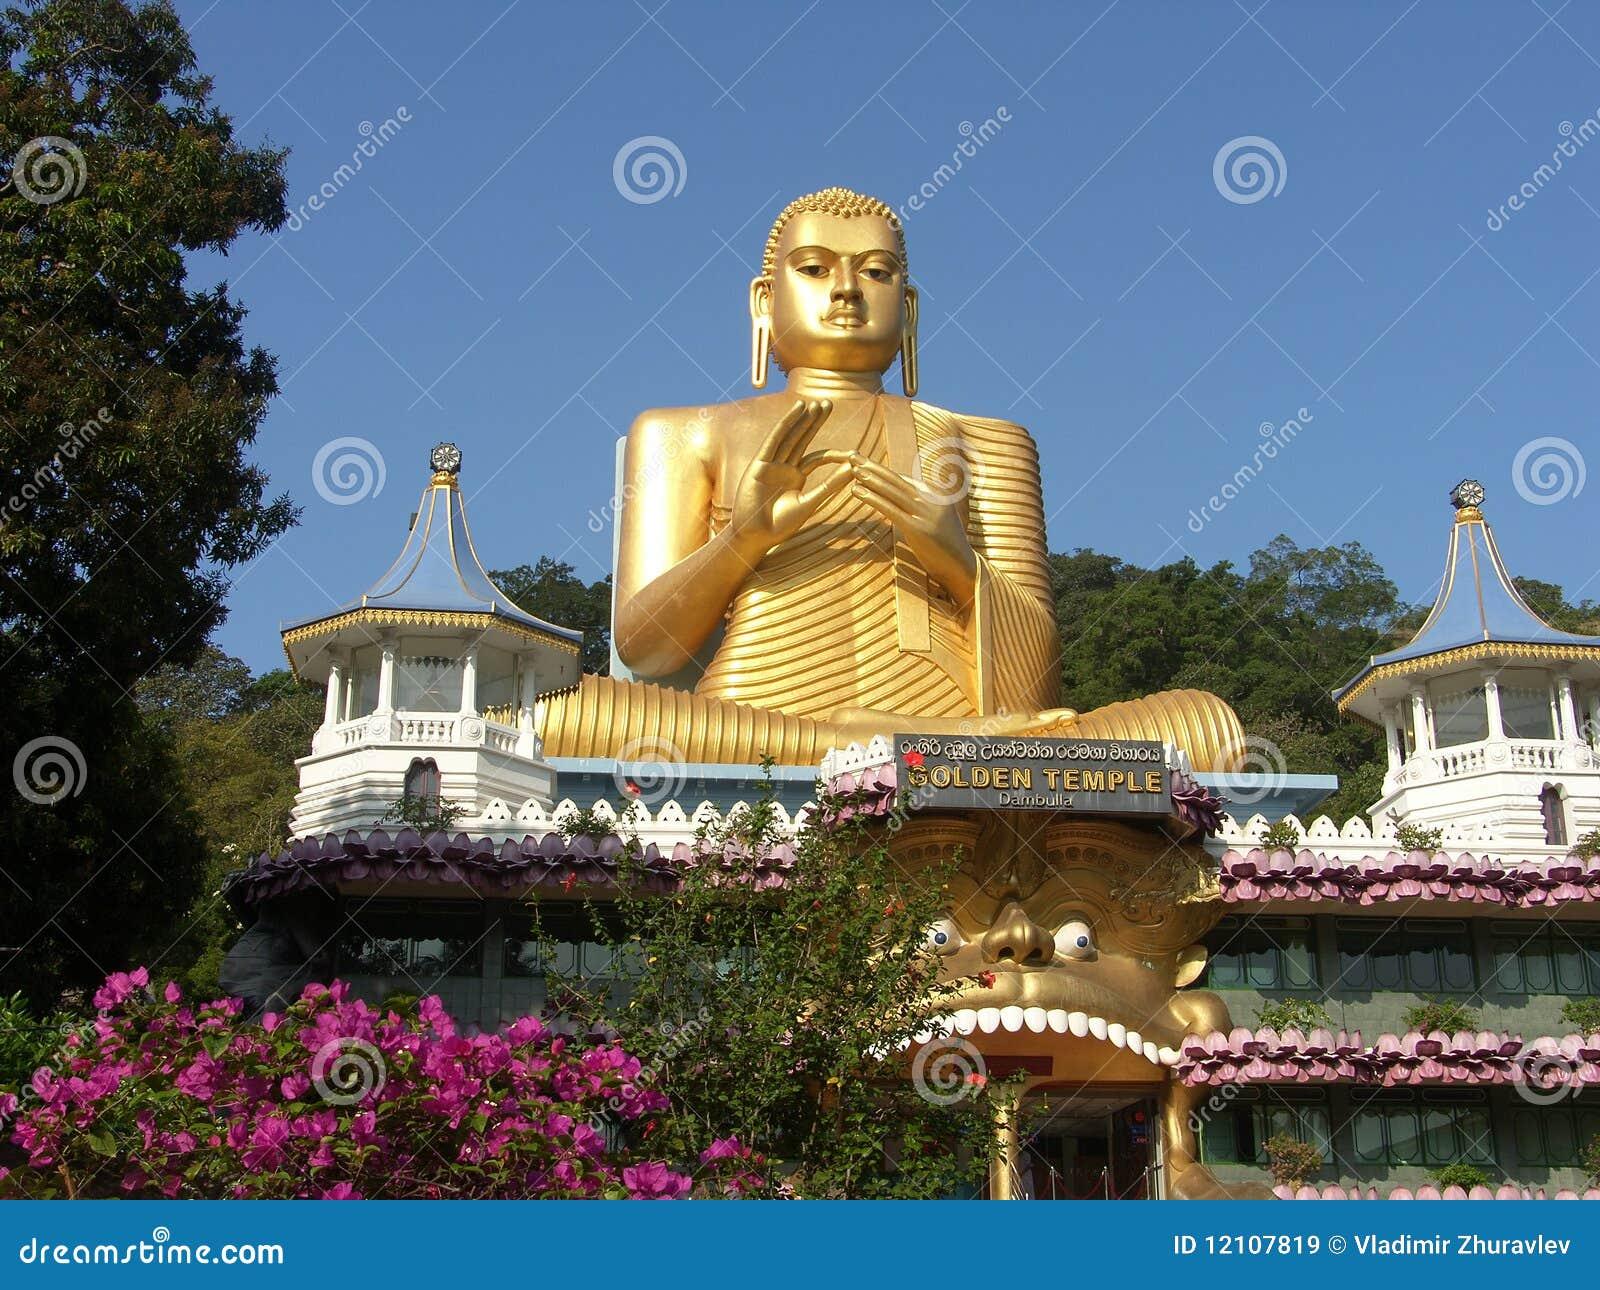 sri lanka buddhist temple - 1000×750